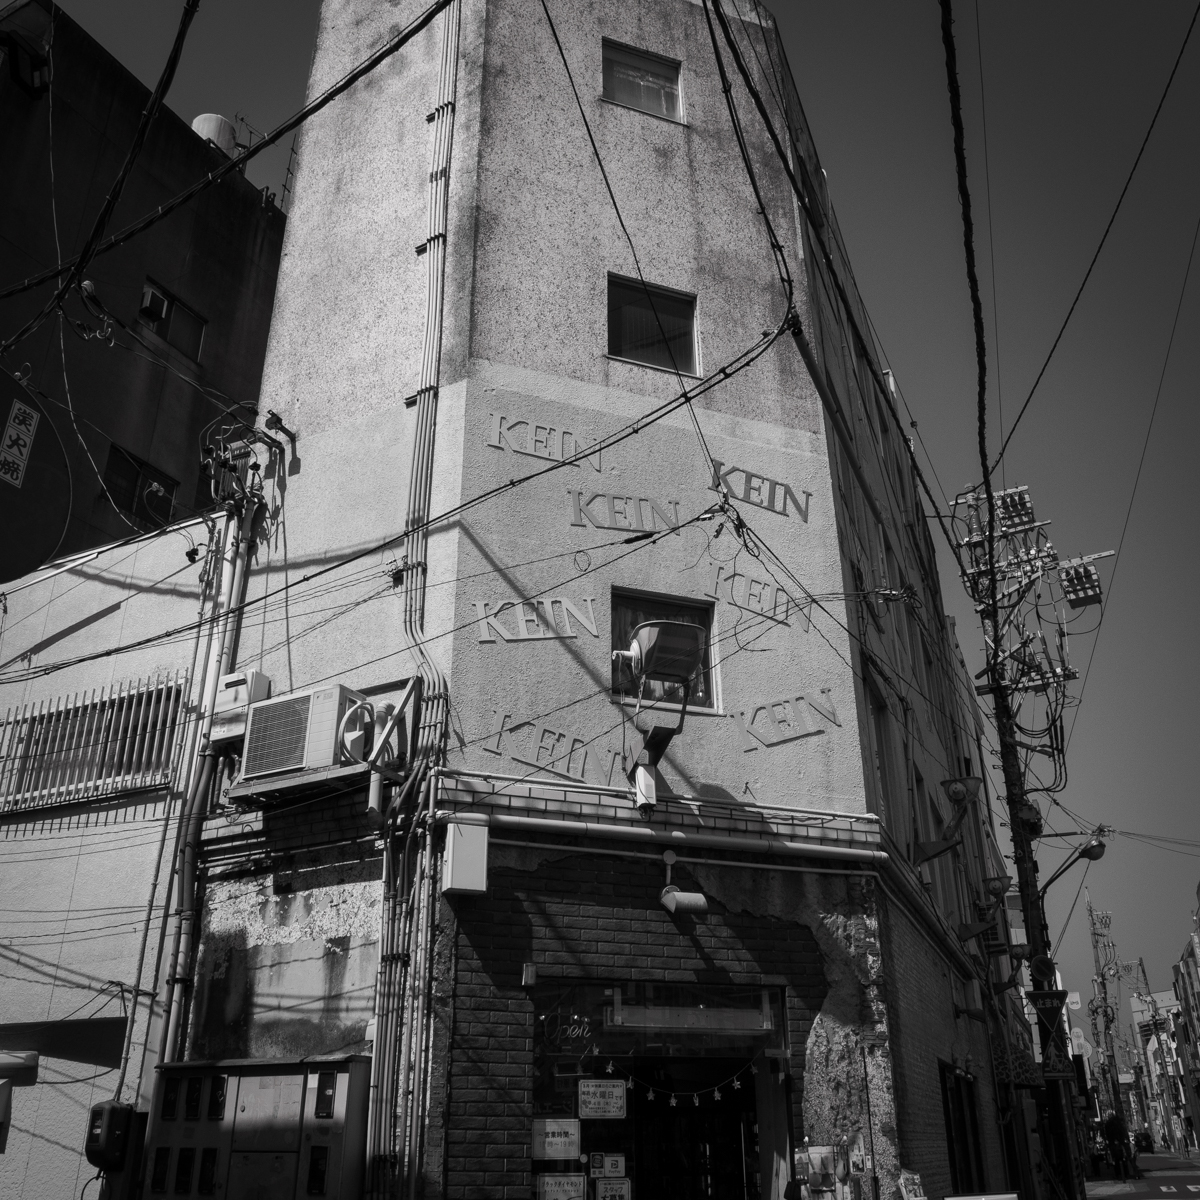 f:id:nagoya-meshi:20210417235317j:plain